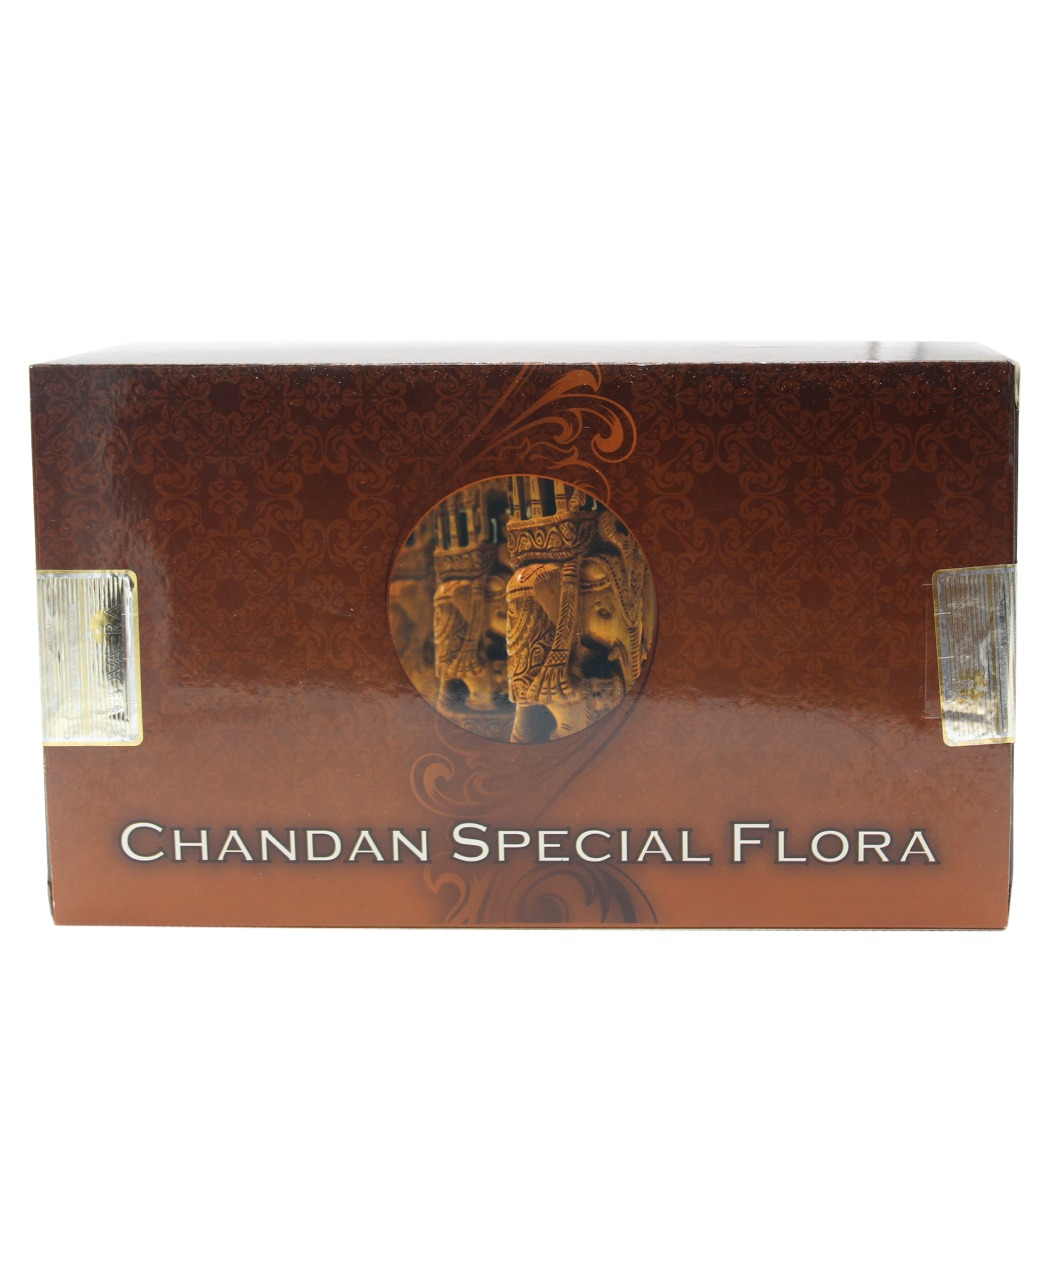 INCENSO ONAM CHANDANS SPECIAL FLORA